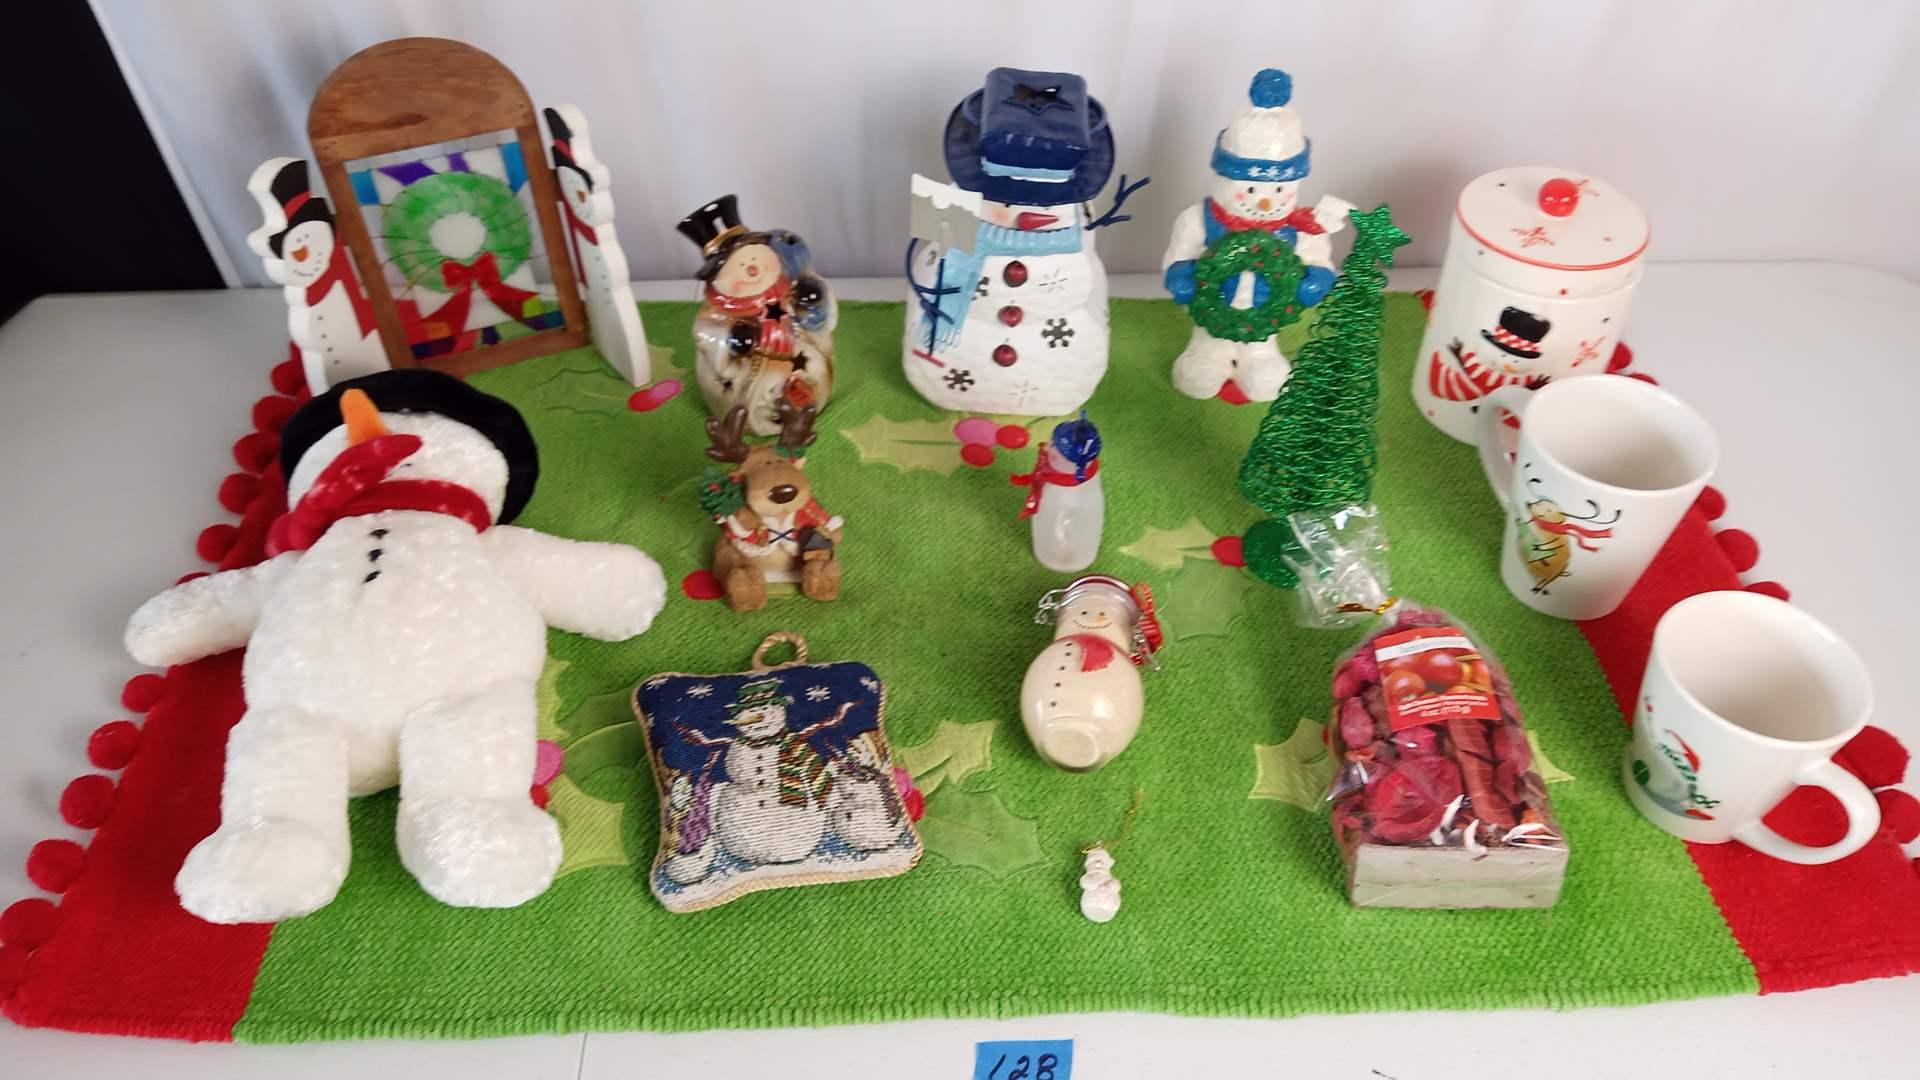 Lot # 128 Snowman Theme Collection: Candy Jars, Pillow, Xmas Tree, Door Hangers, Mugs, Rug, etc